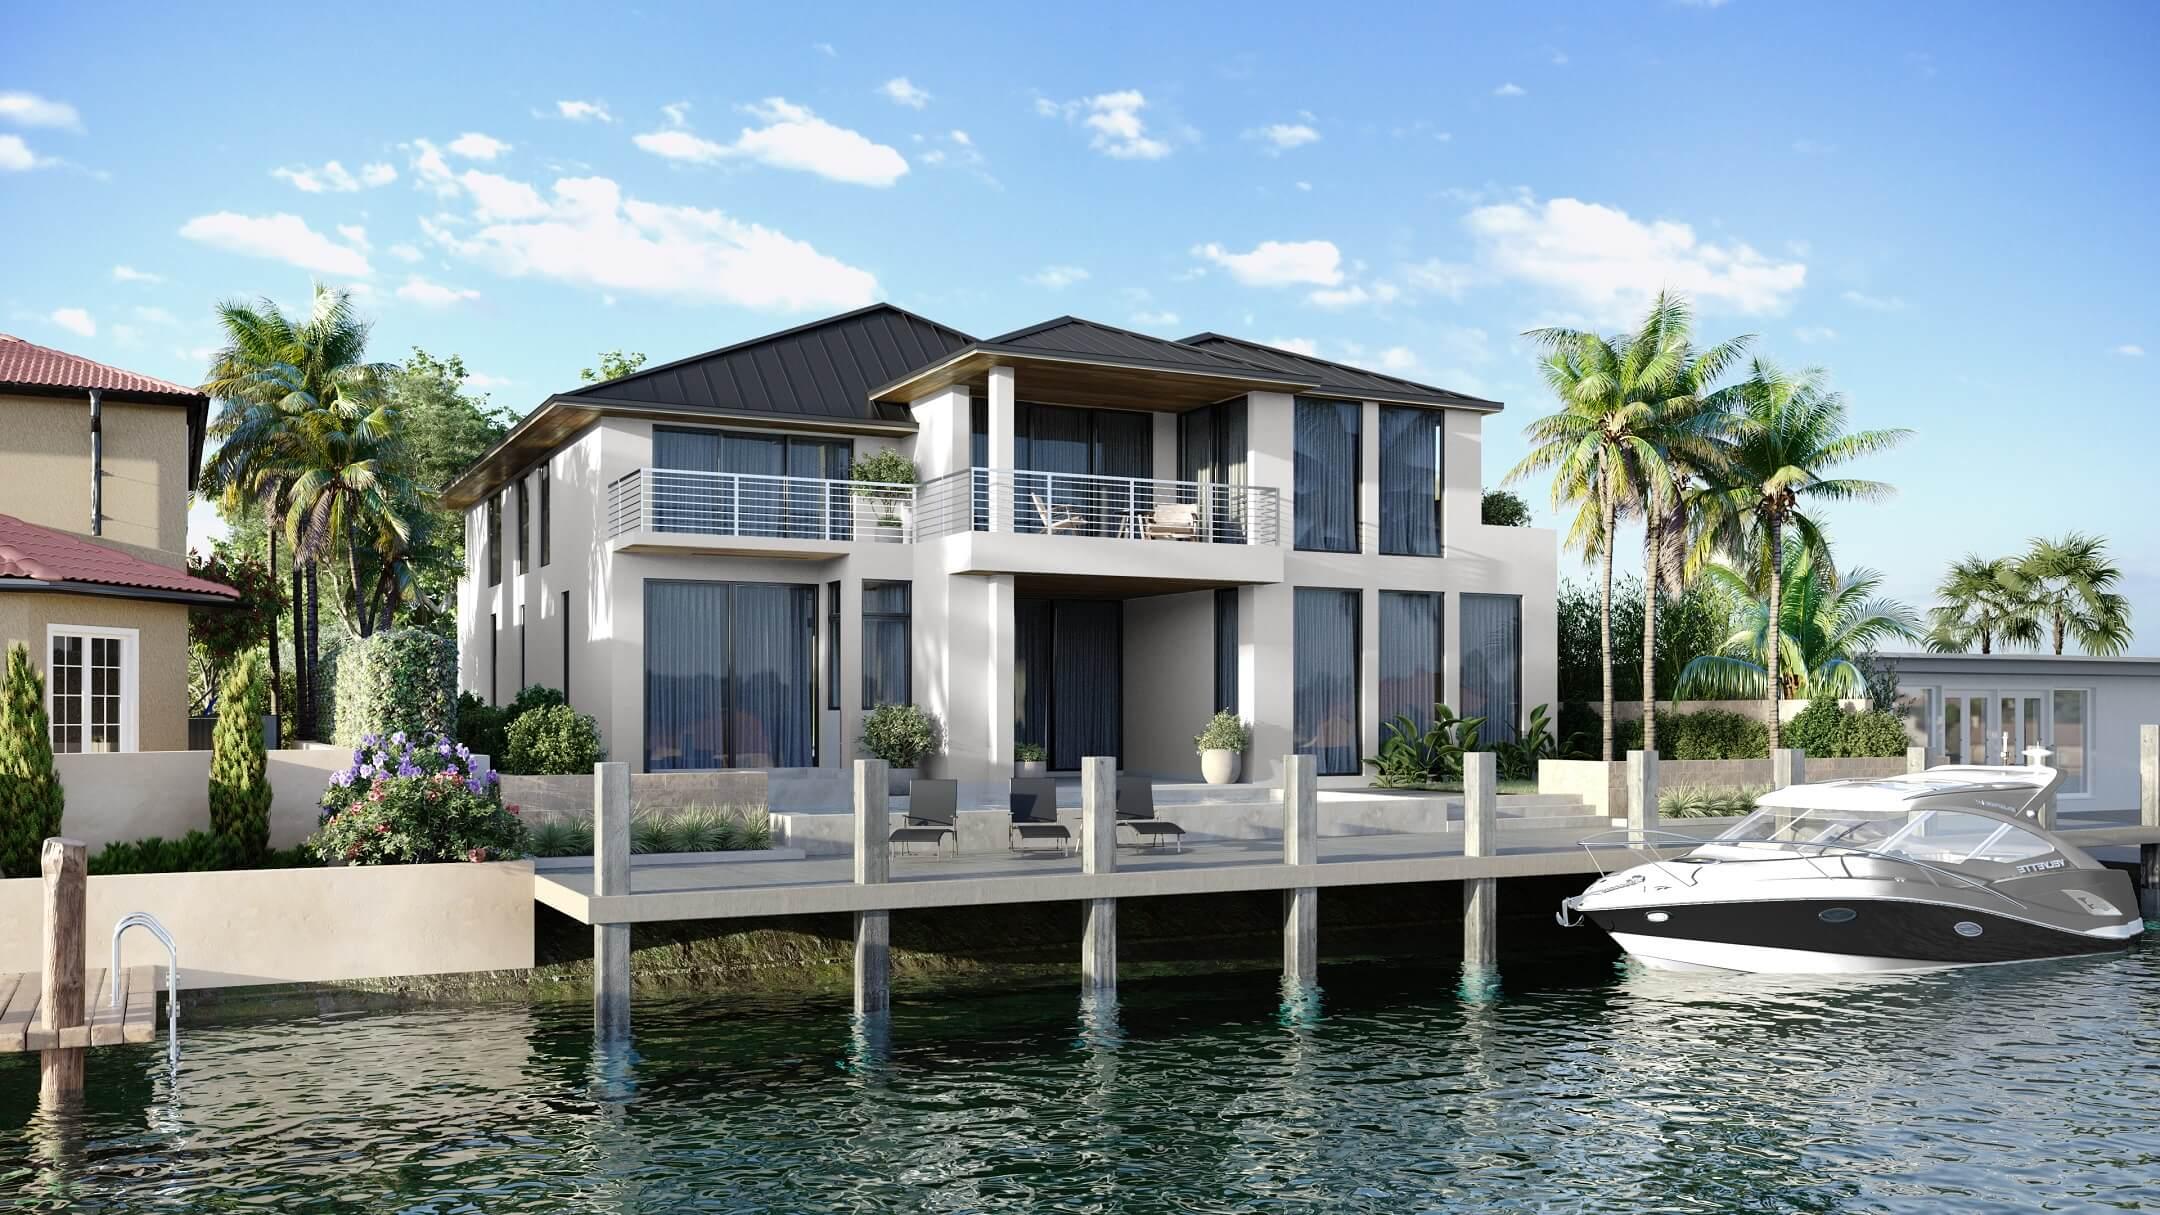 3D Rendering for Real Estate Property